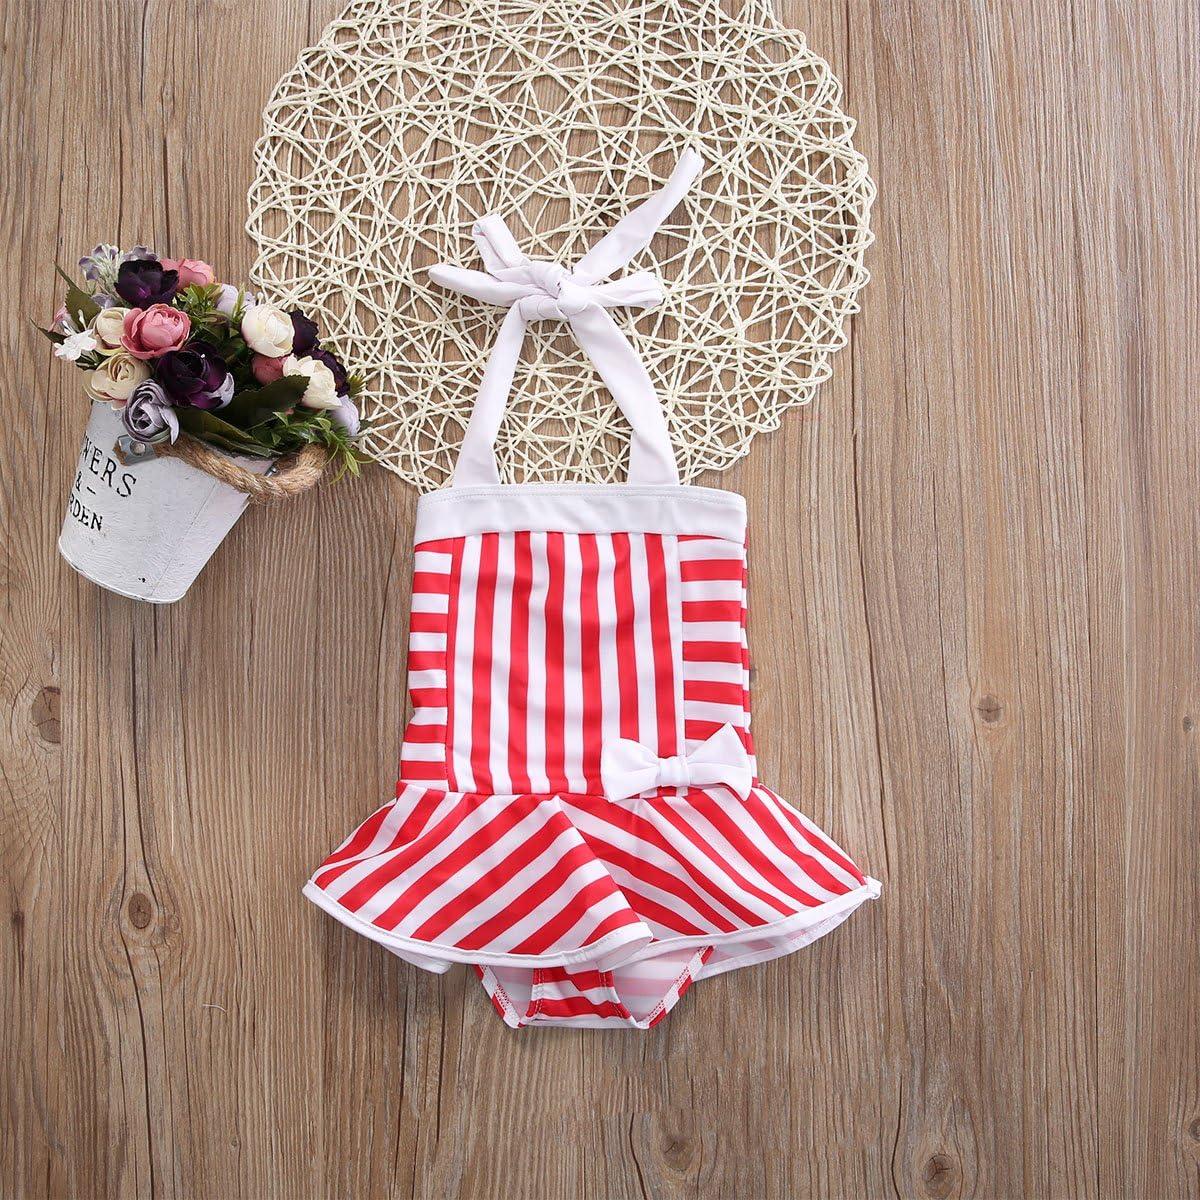 WALLARENEAR Kids Toddler Baby Girls Swimwear Off-Shoulder One Pieces Swimsuit Bathing Suit Bikini Set Outfits Summer